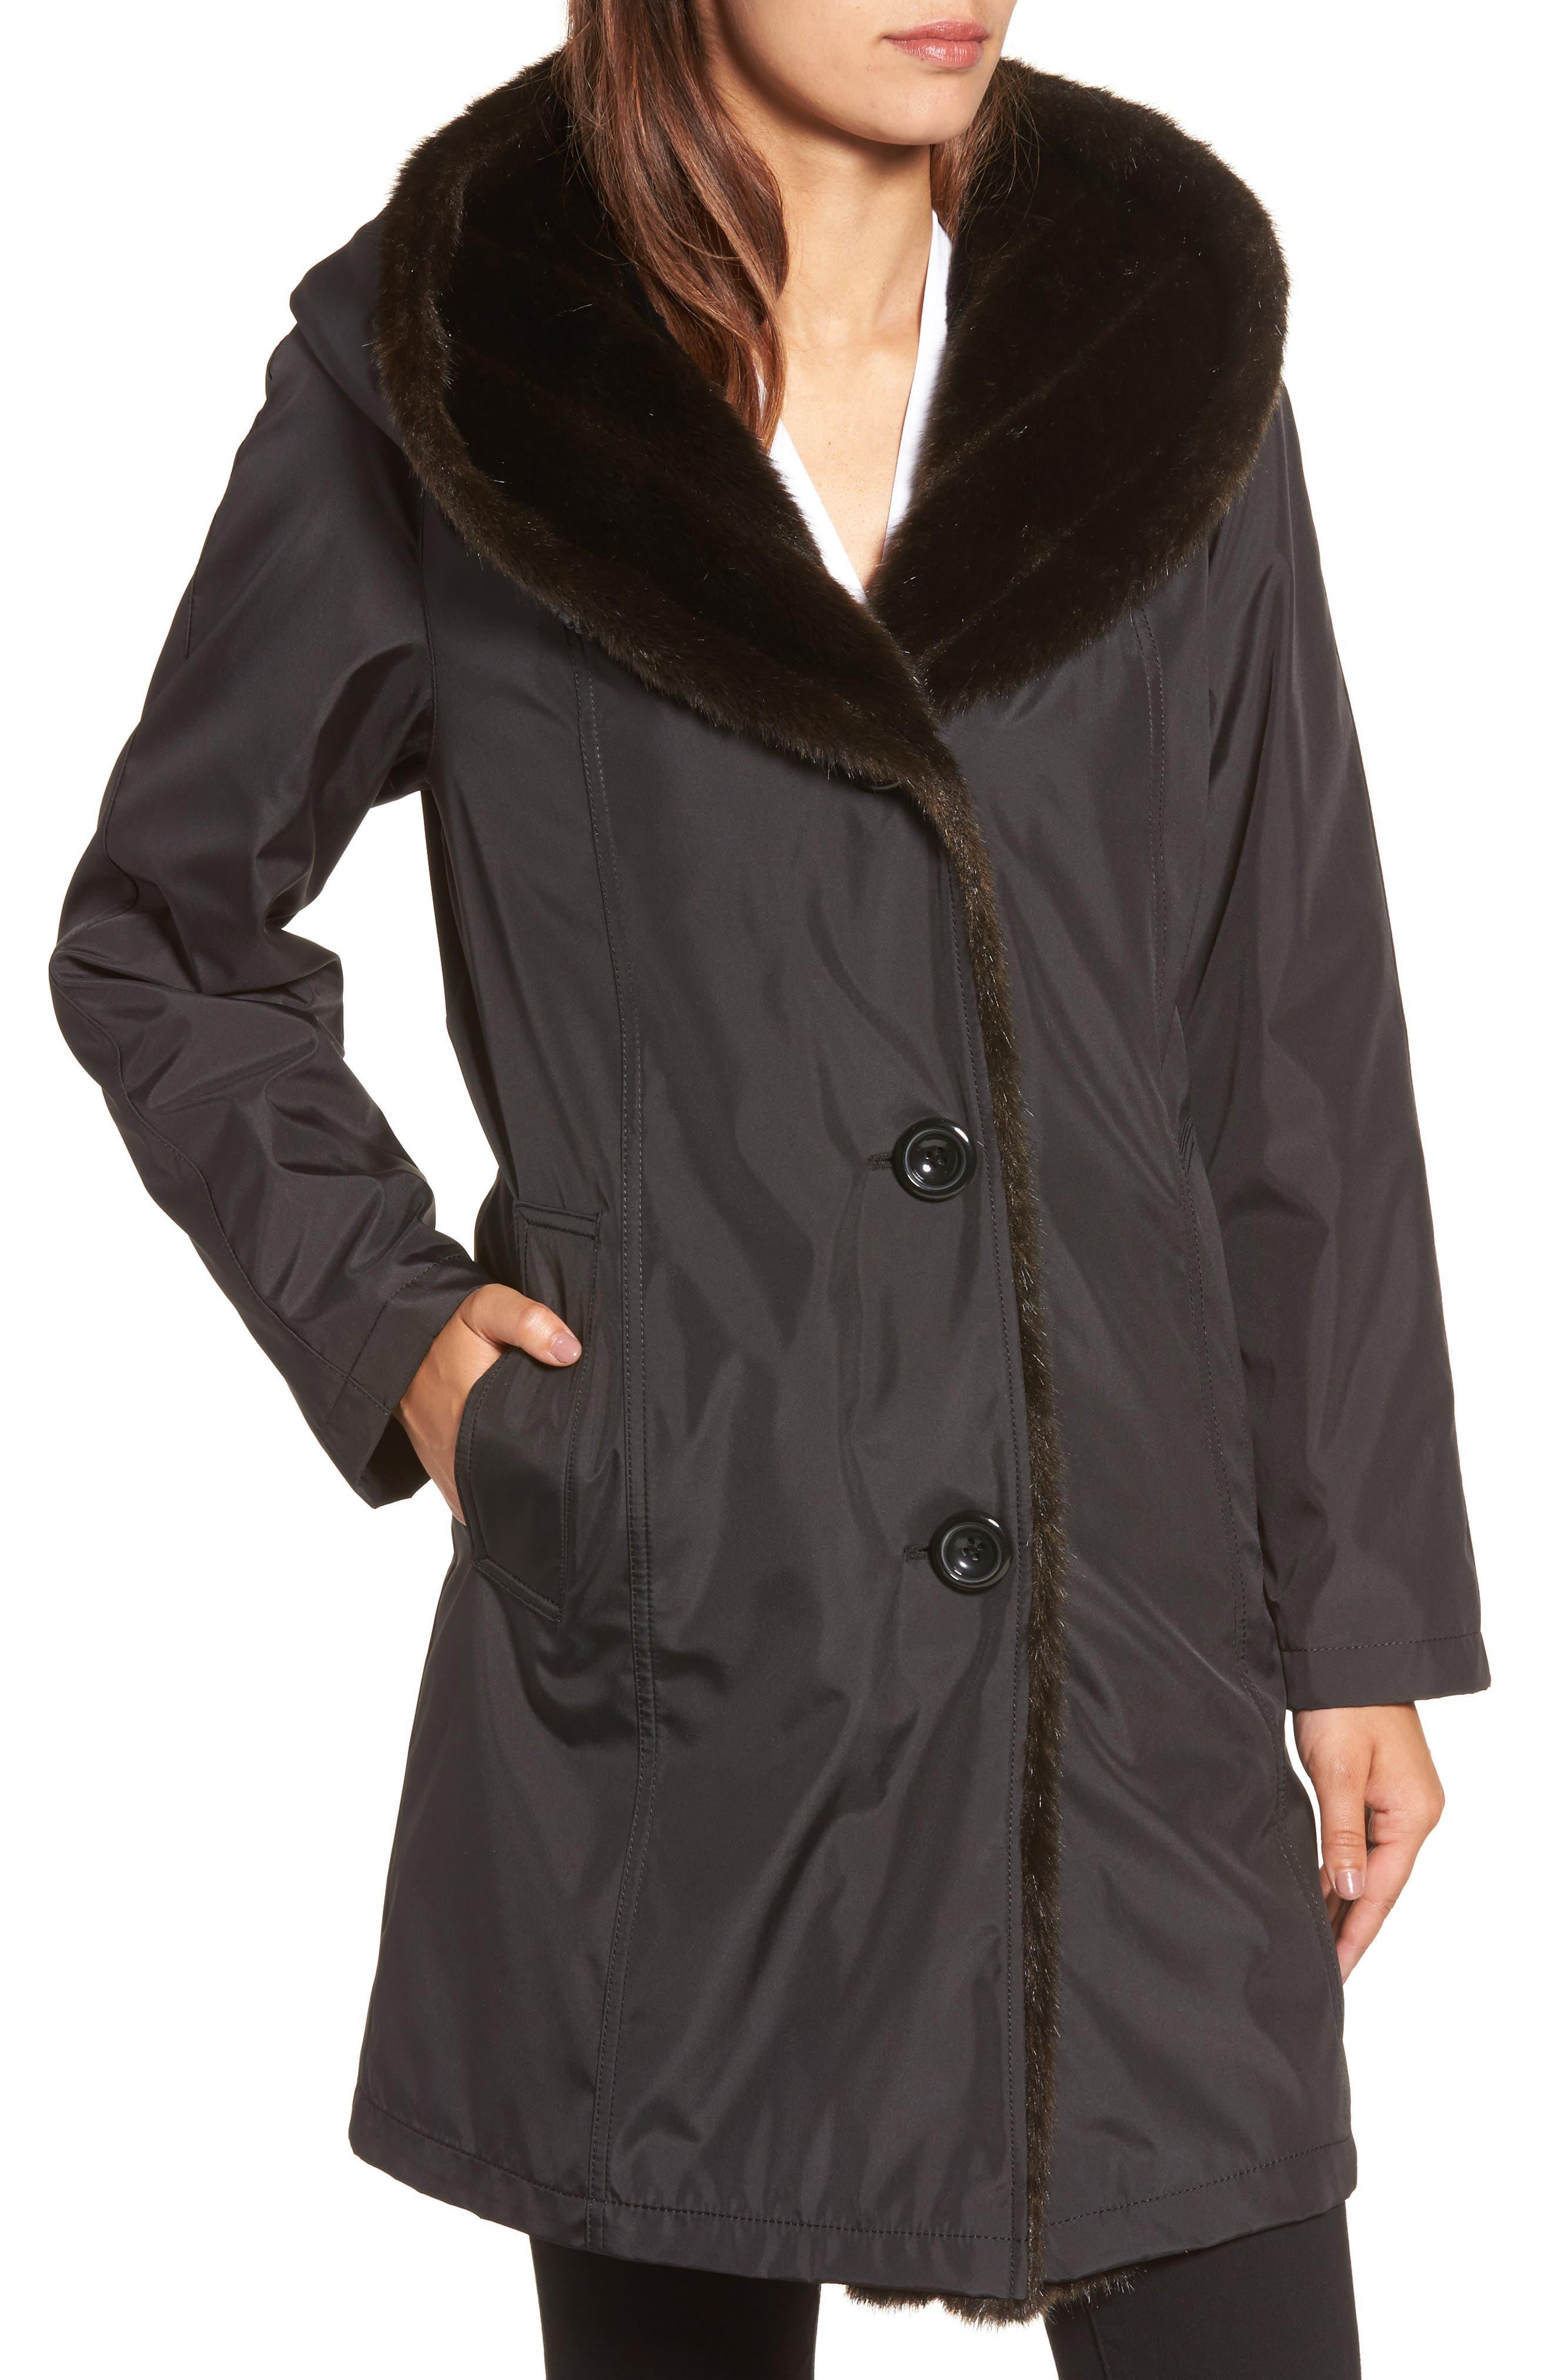 Storm Coat with Faux Fur Trim & Lining,                             Alternate thumbnail 4, color,                             001